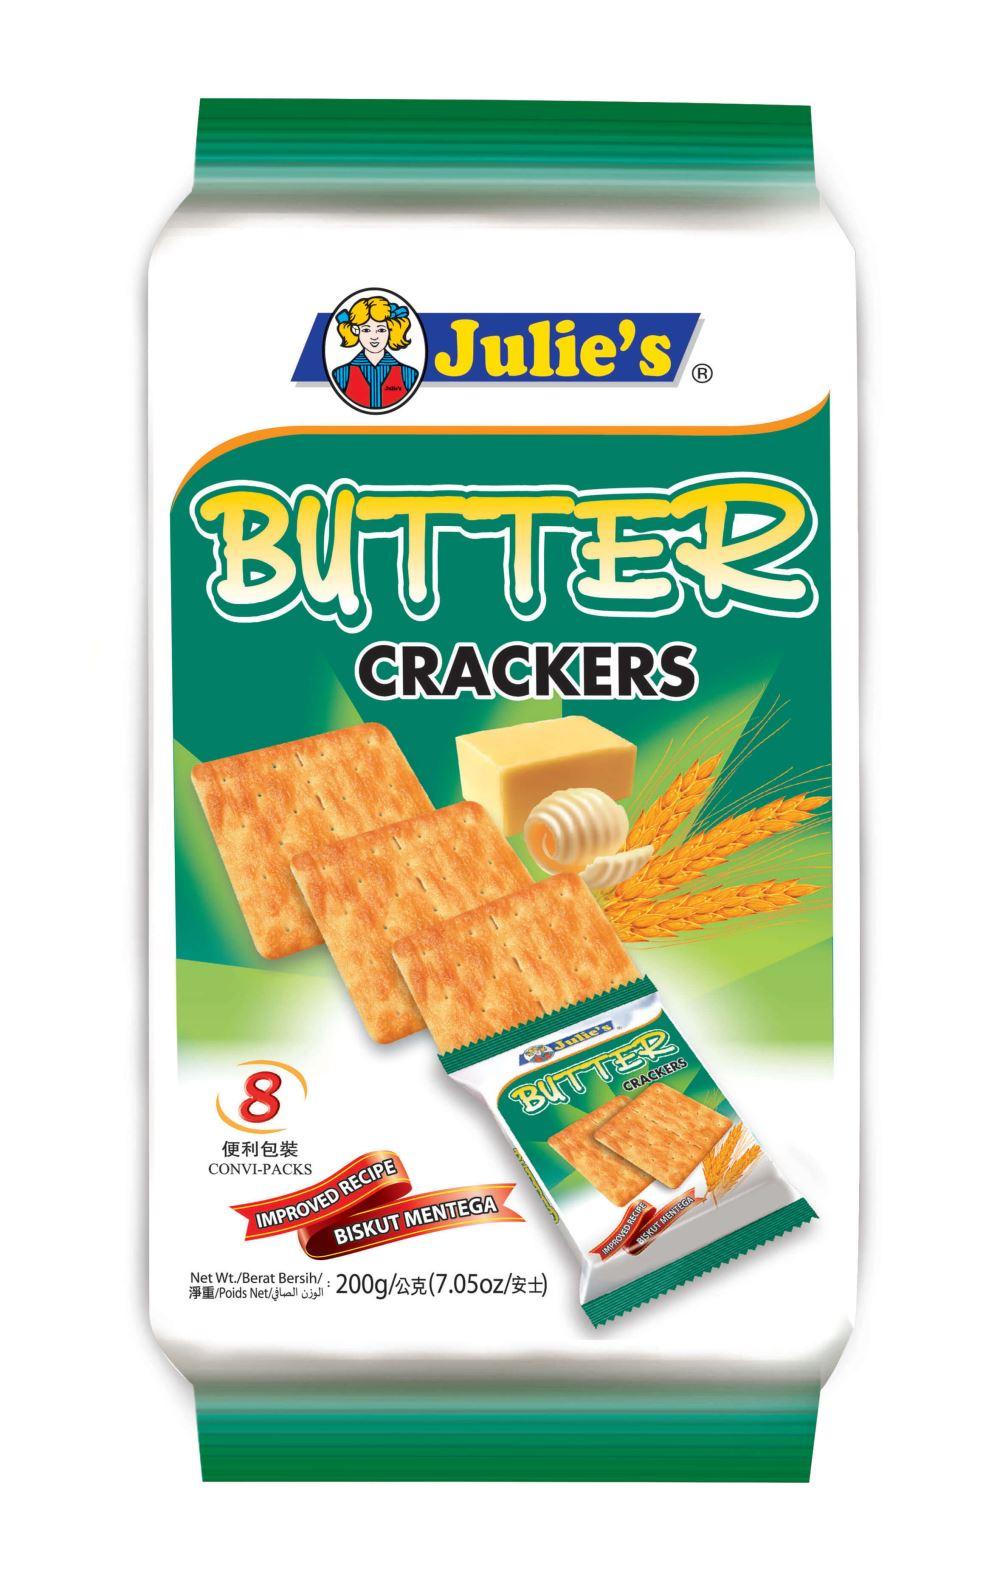 Butter Crackers (8's) 200g